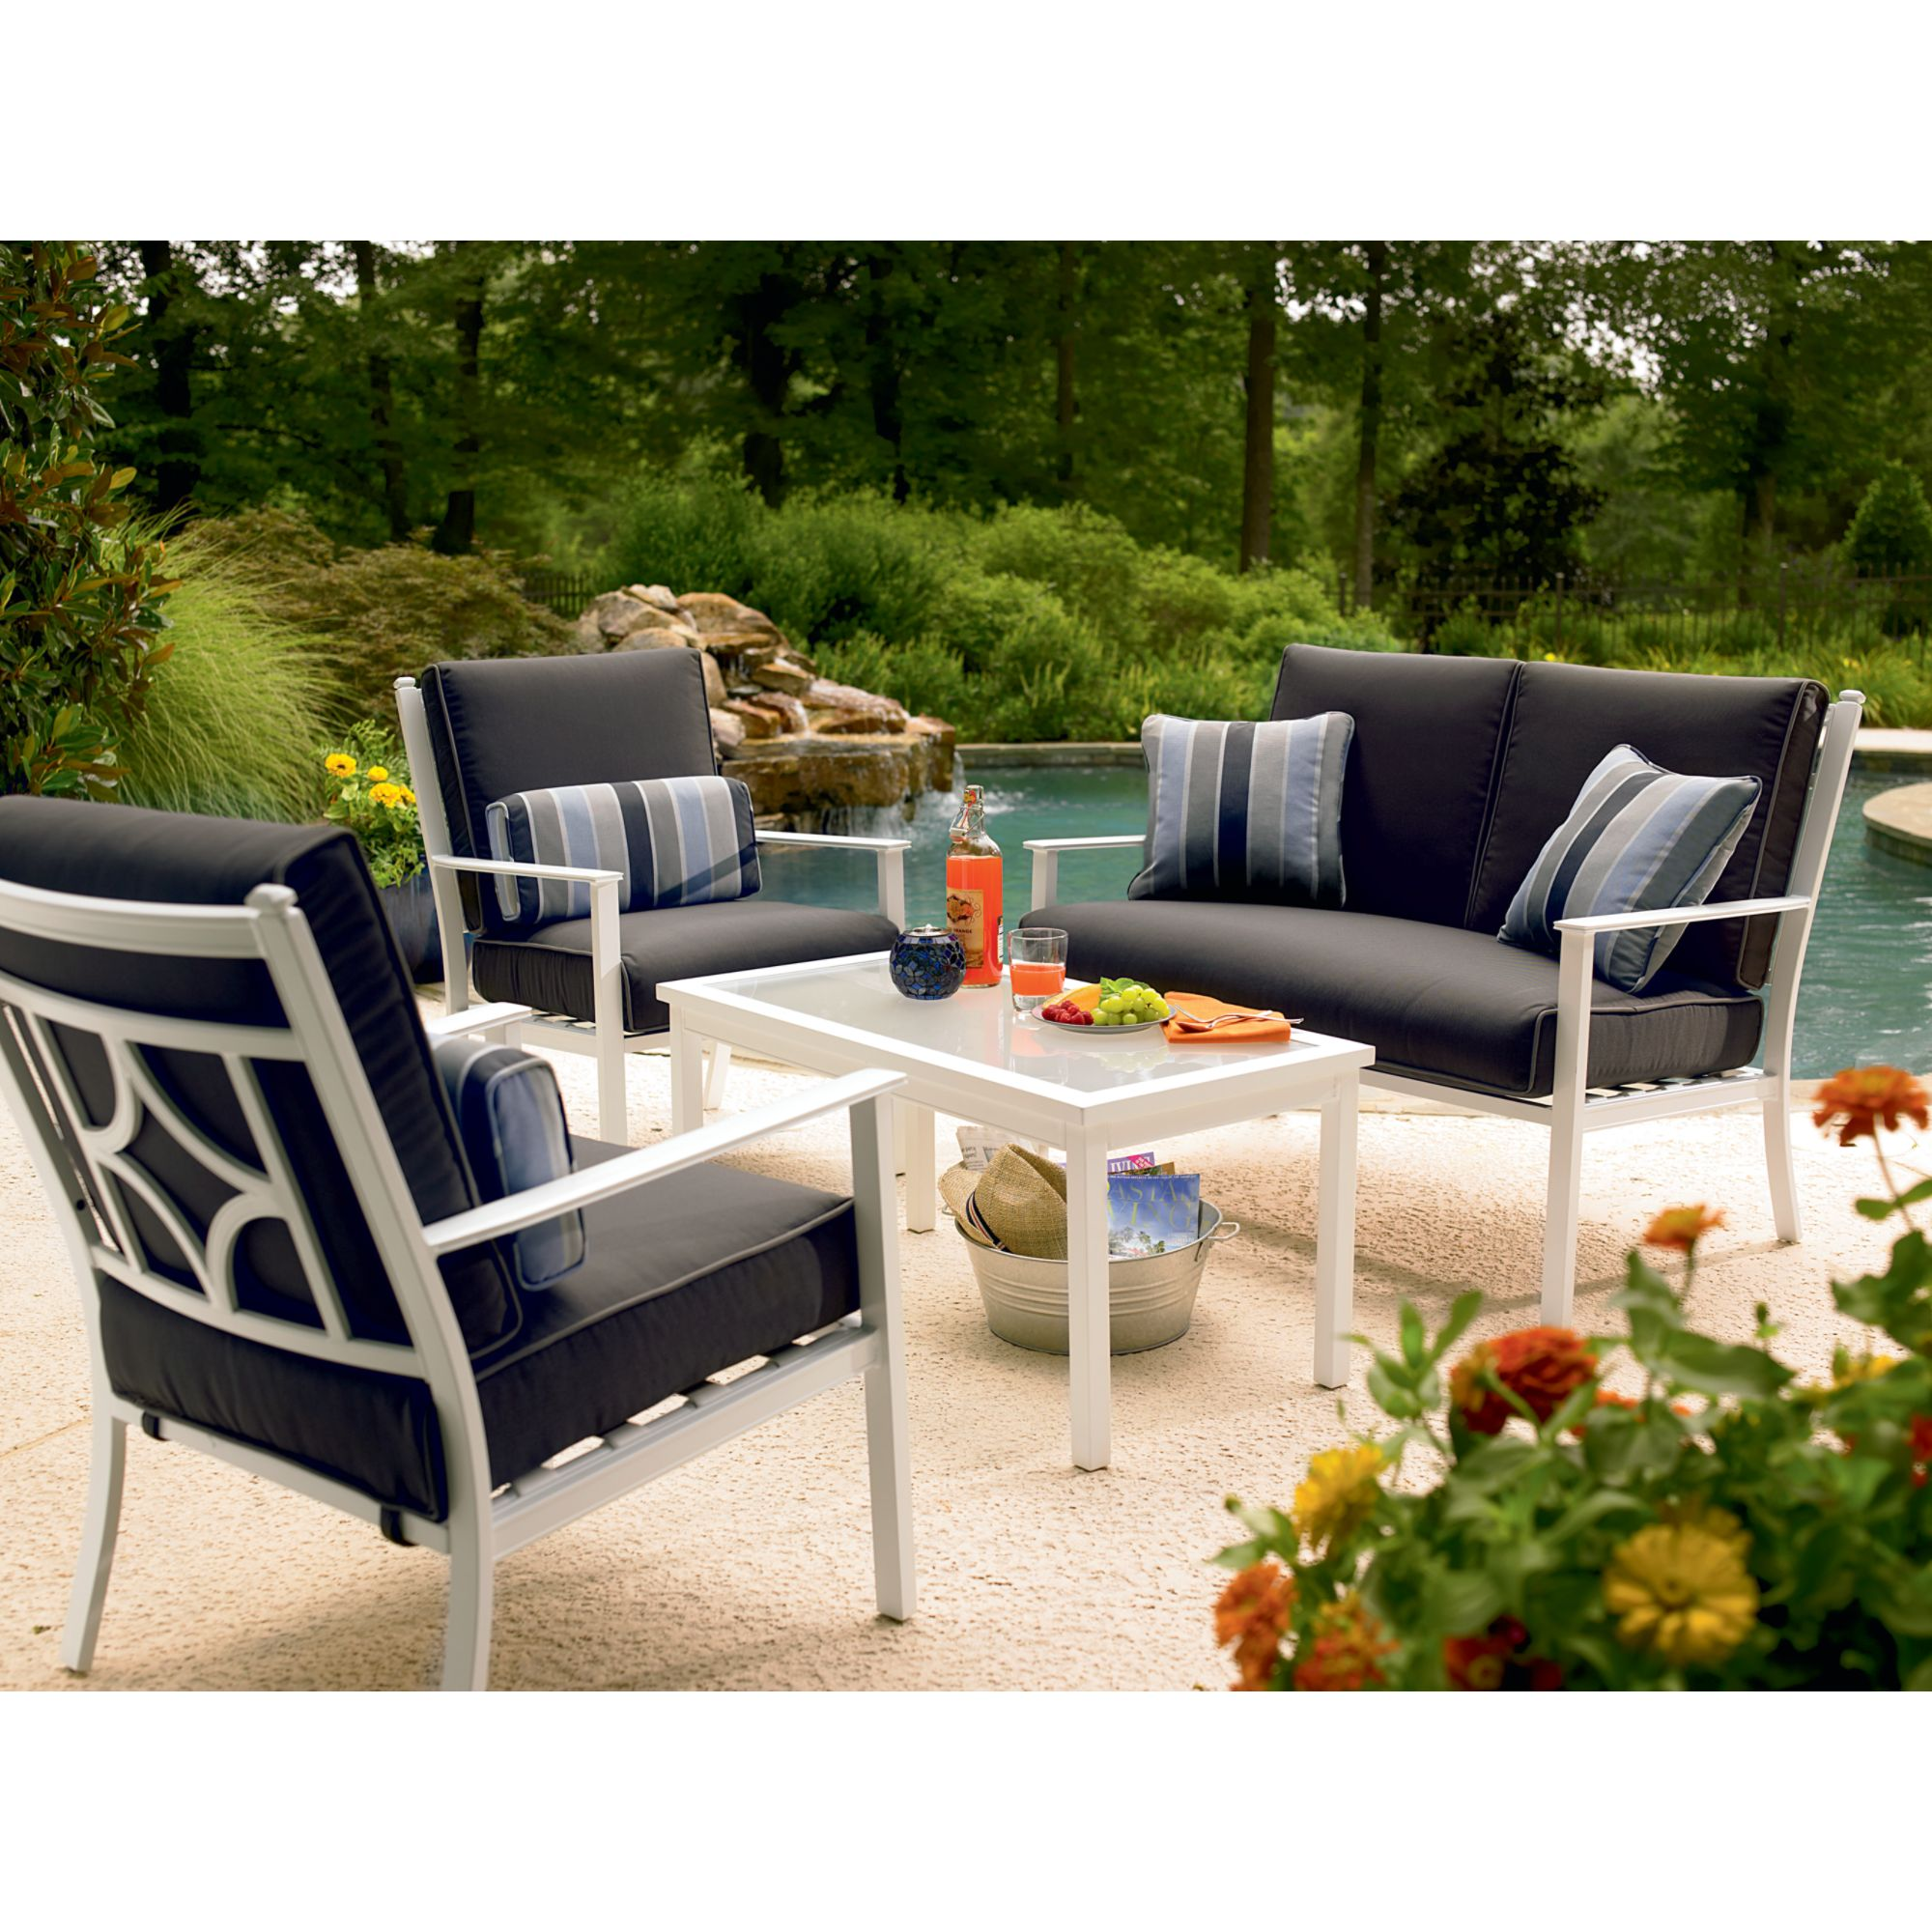 Sears Patio Furniture | Sears Com Coupons | Aluminum Patio Furniture